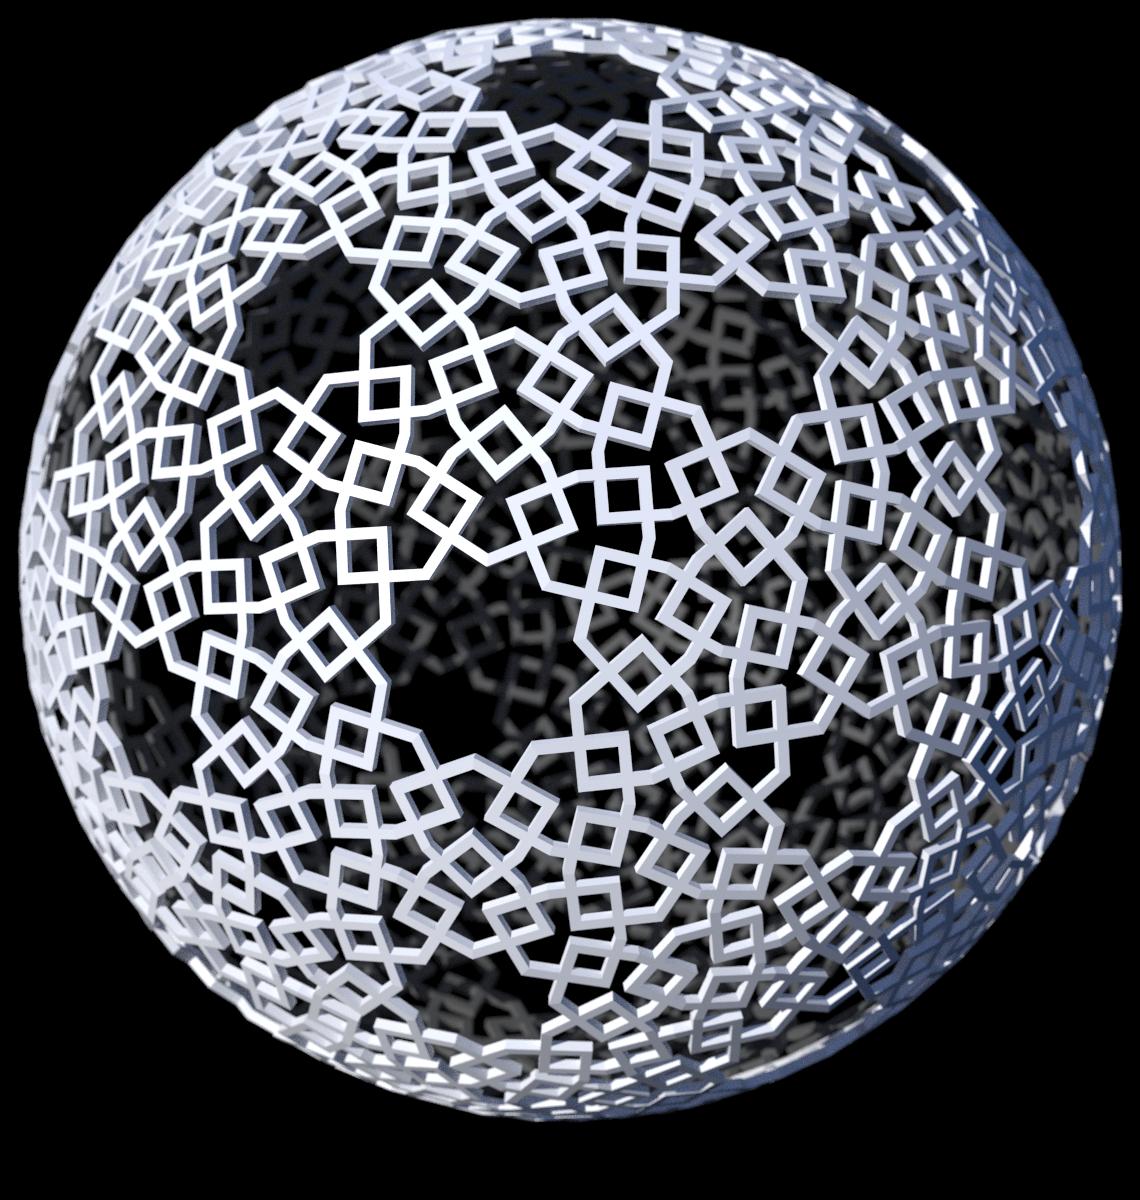 arabesque by taffgoch digital art 3 dimensional art objects other 2012 ... Easy Arabesque Art